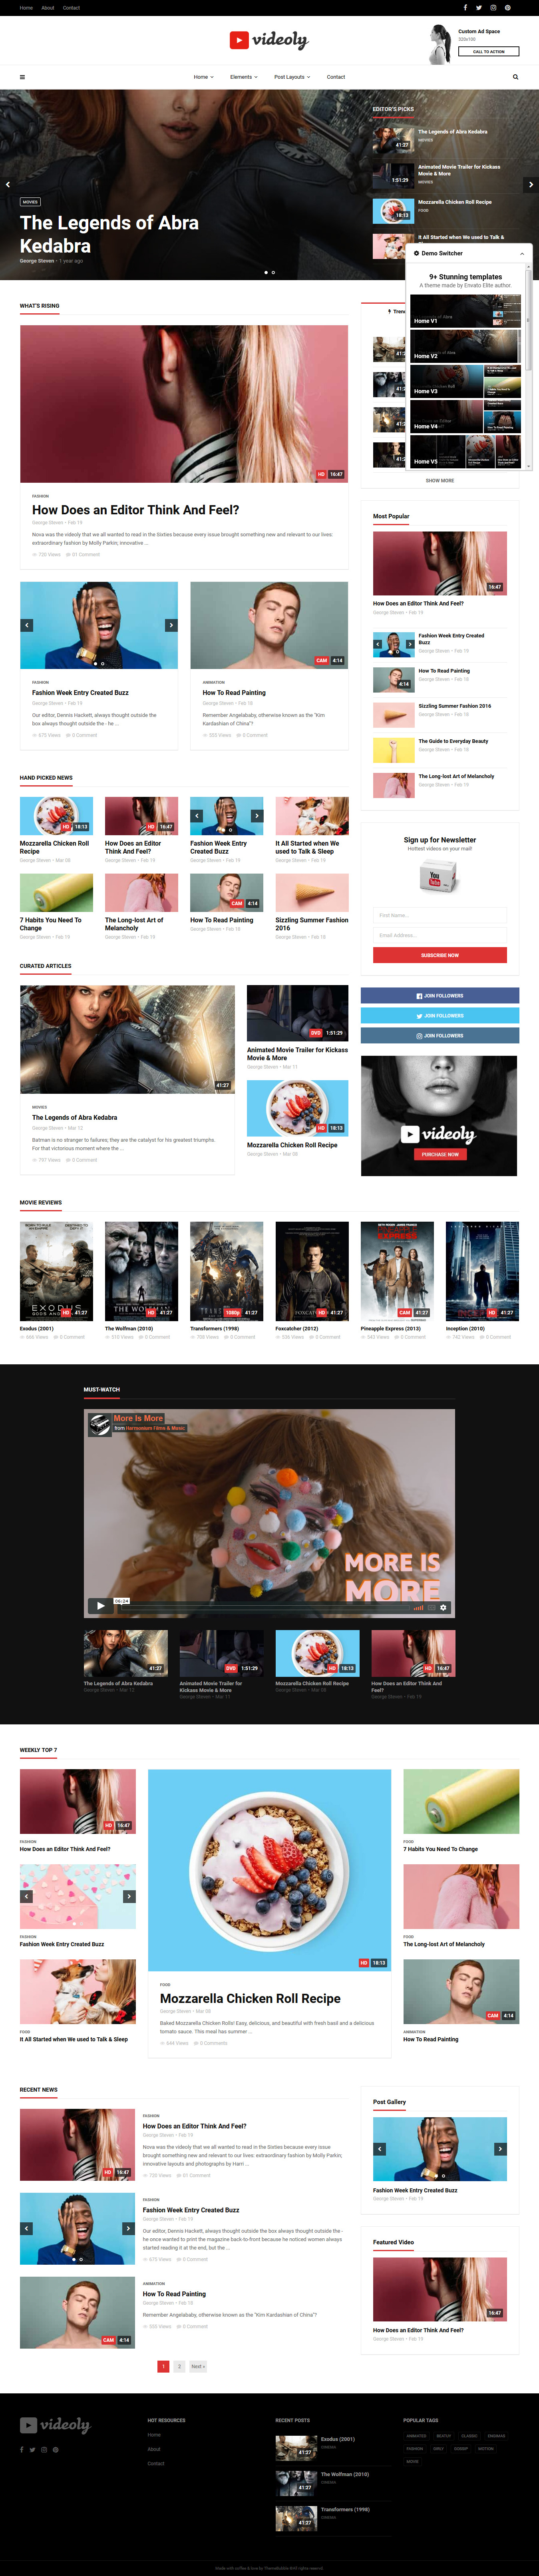 videloy best premium video music wordpress theme - 10+ Best Video and Music WordPress Themes (Premium Version)